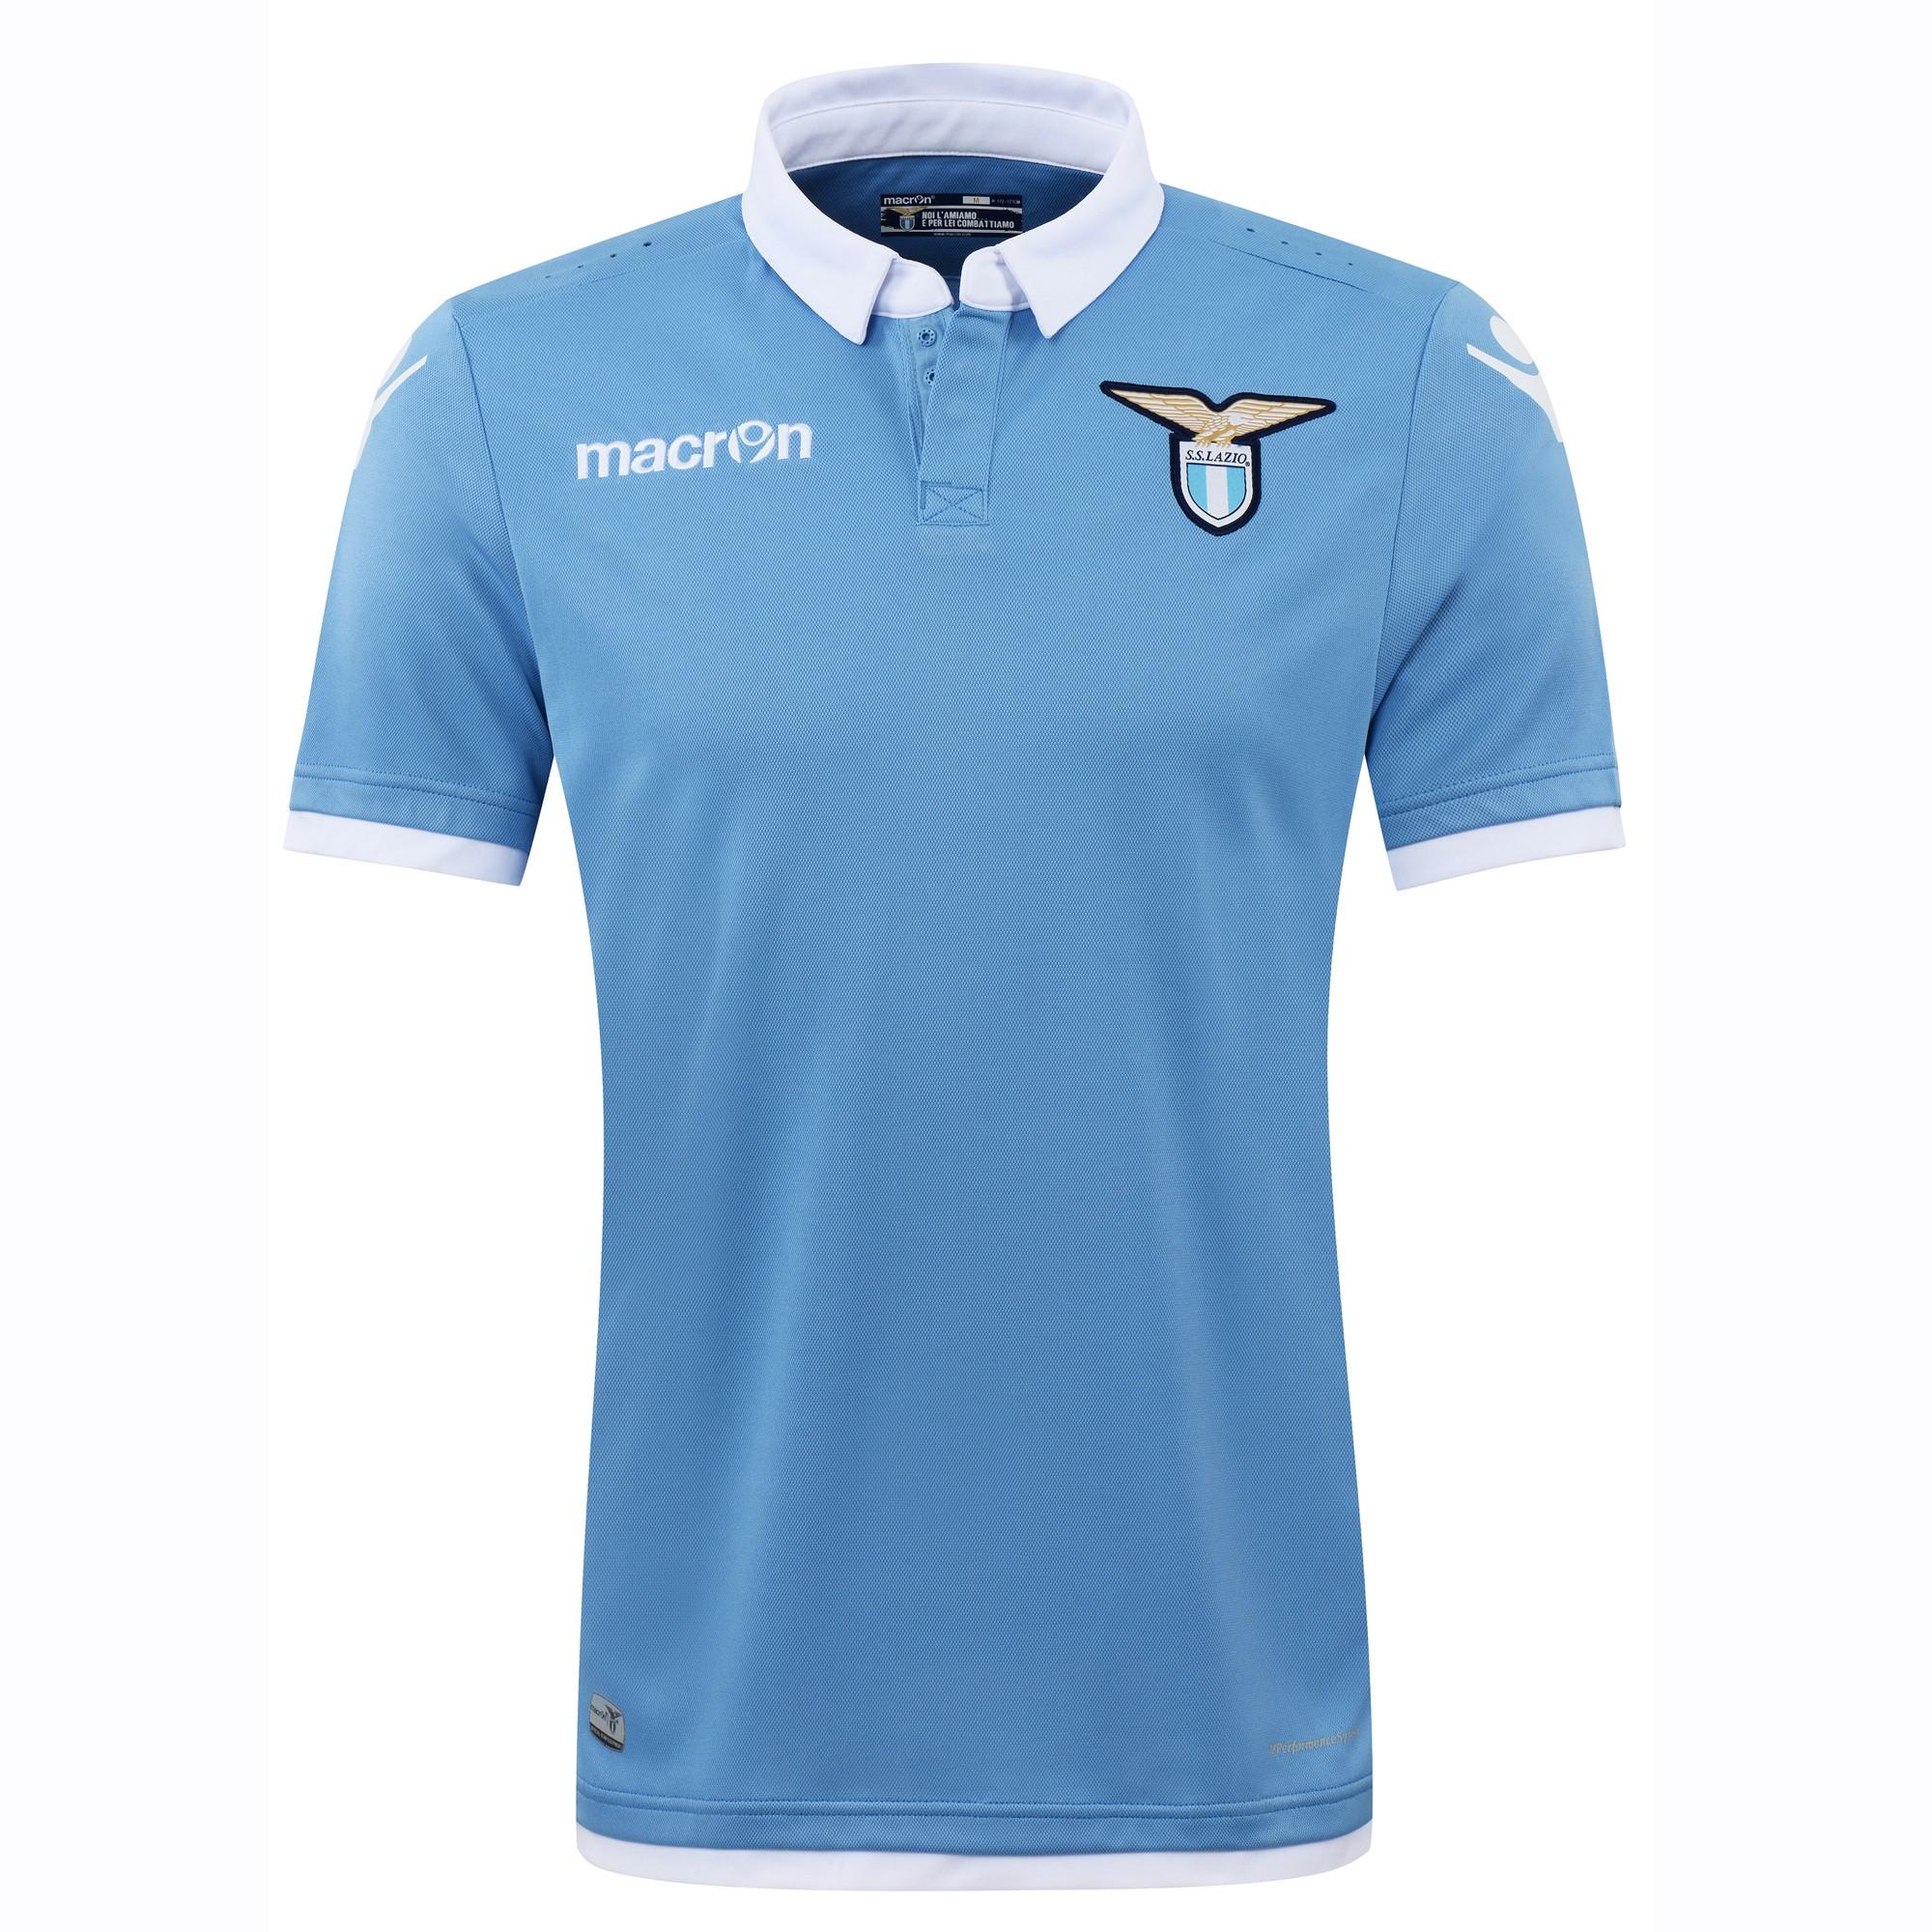 2016-2017 Lazio Authentic Home Match Shirt